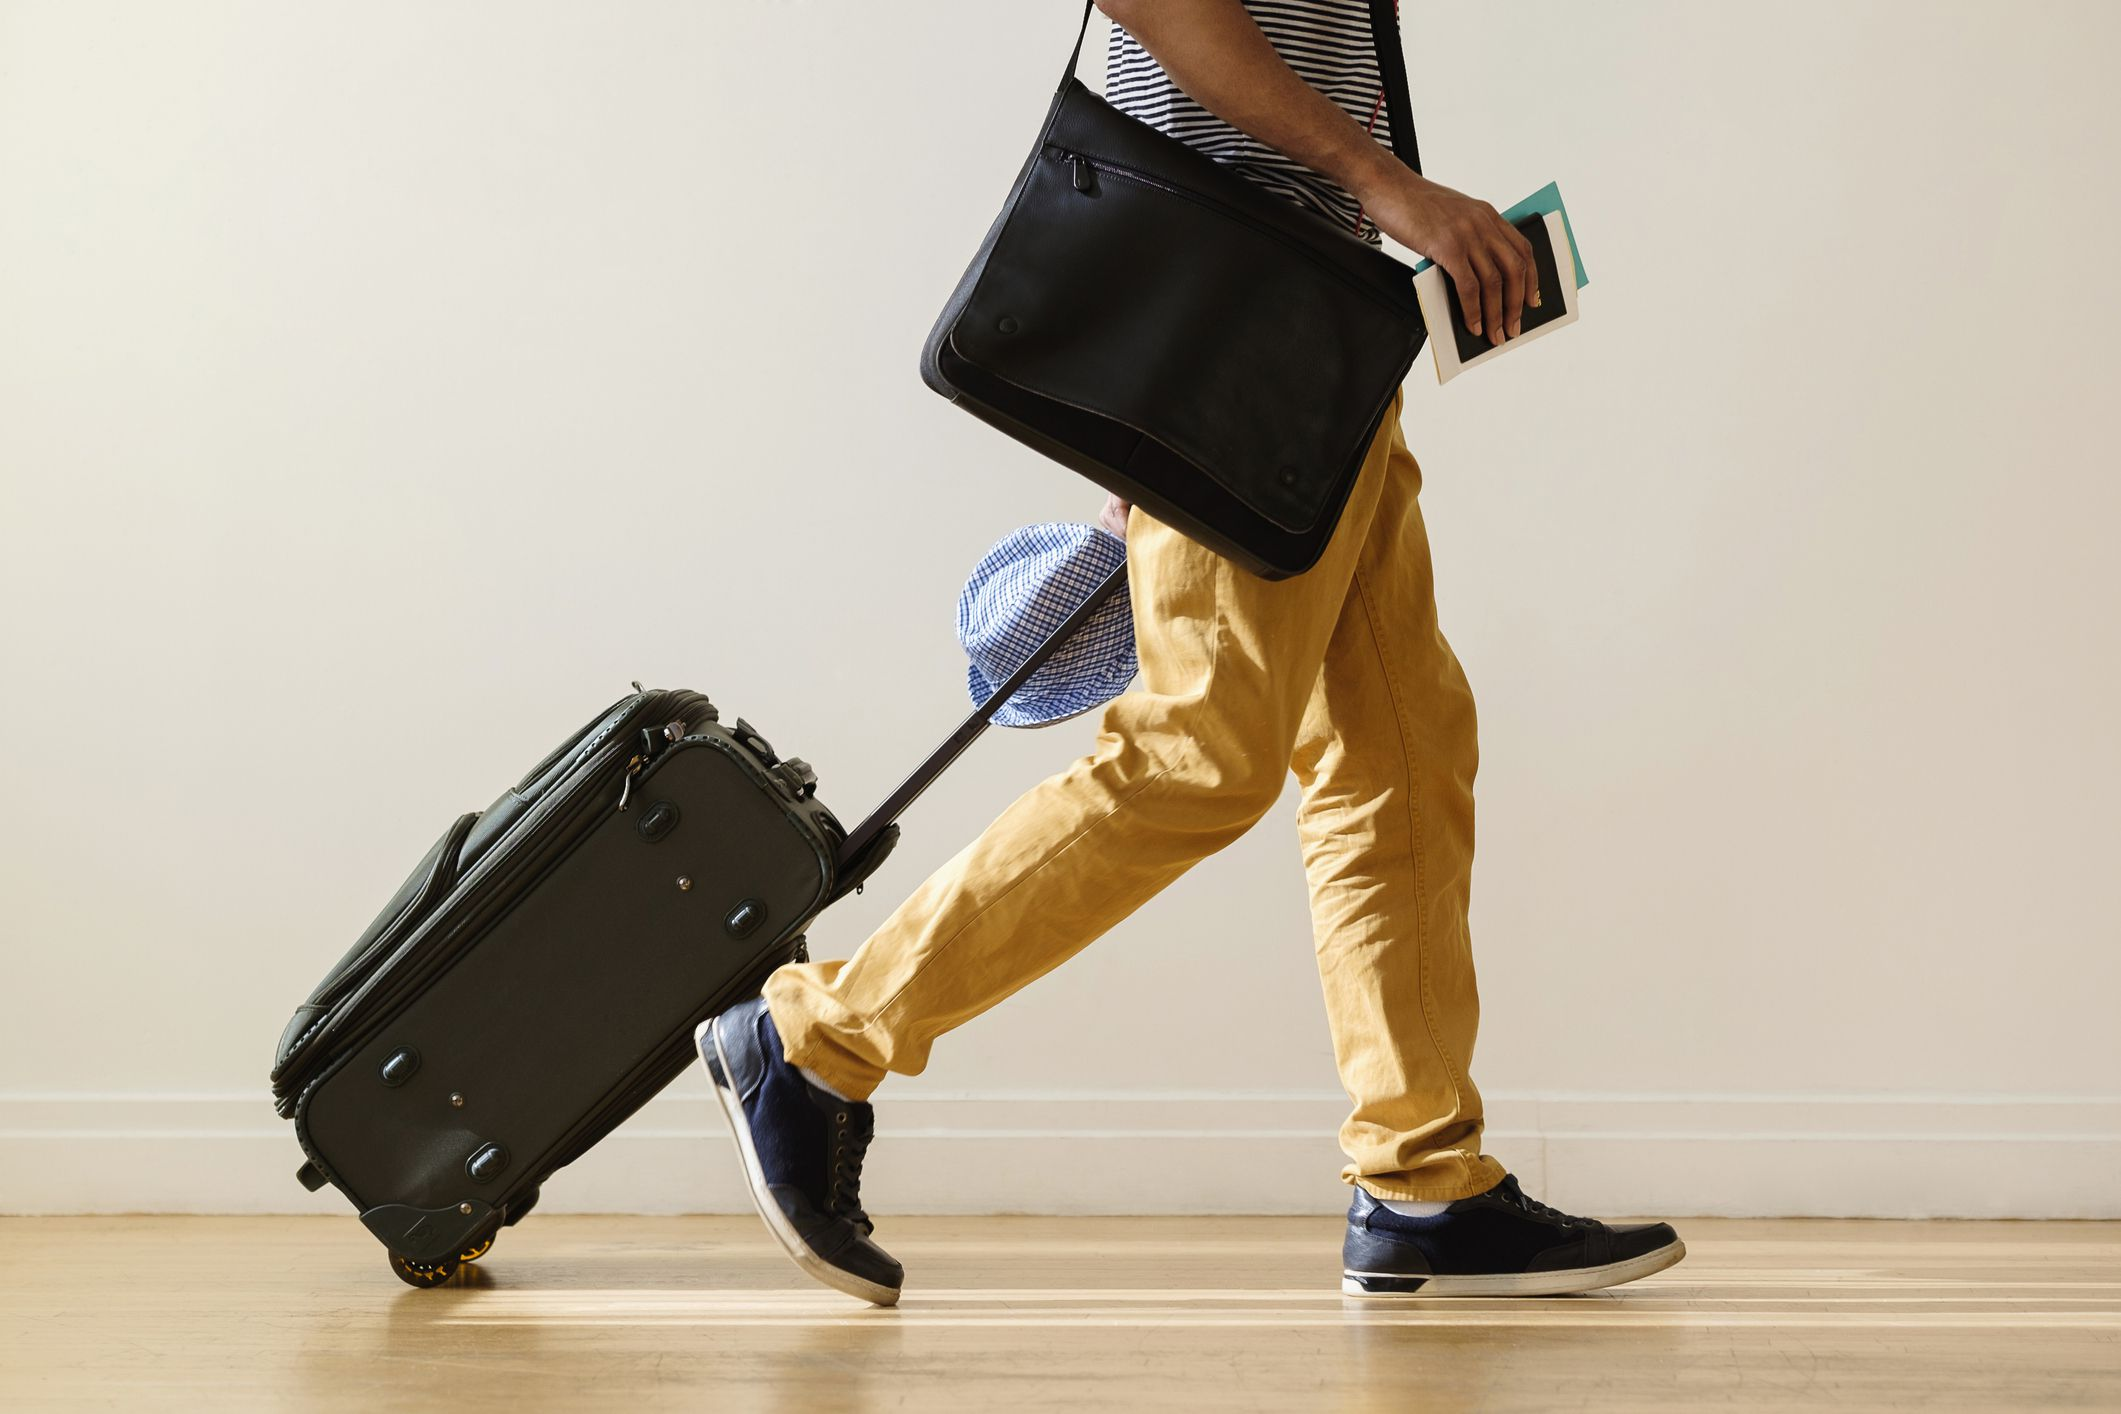 c53b4614449 The 7 Best Herschel Luggage Items of 2019